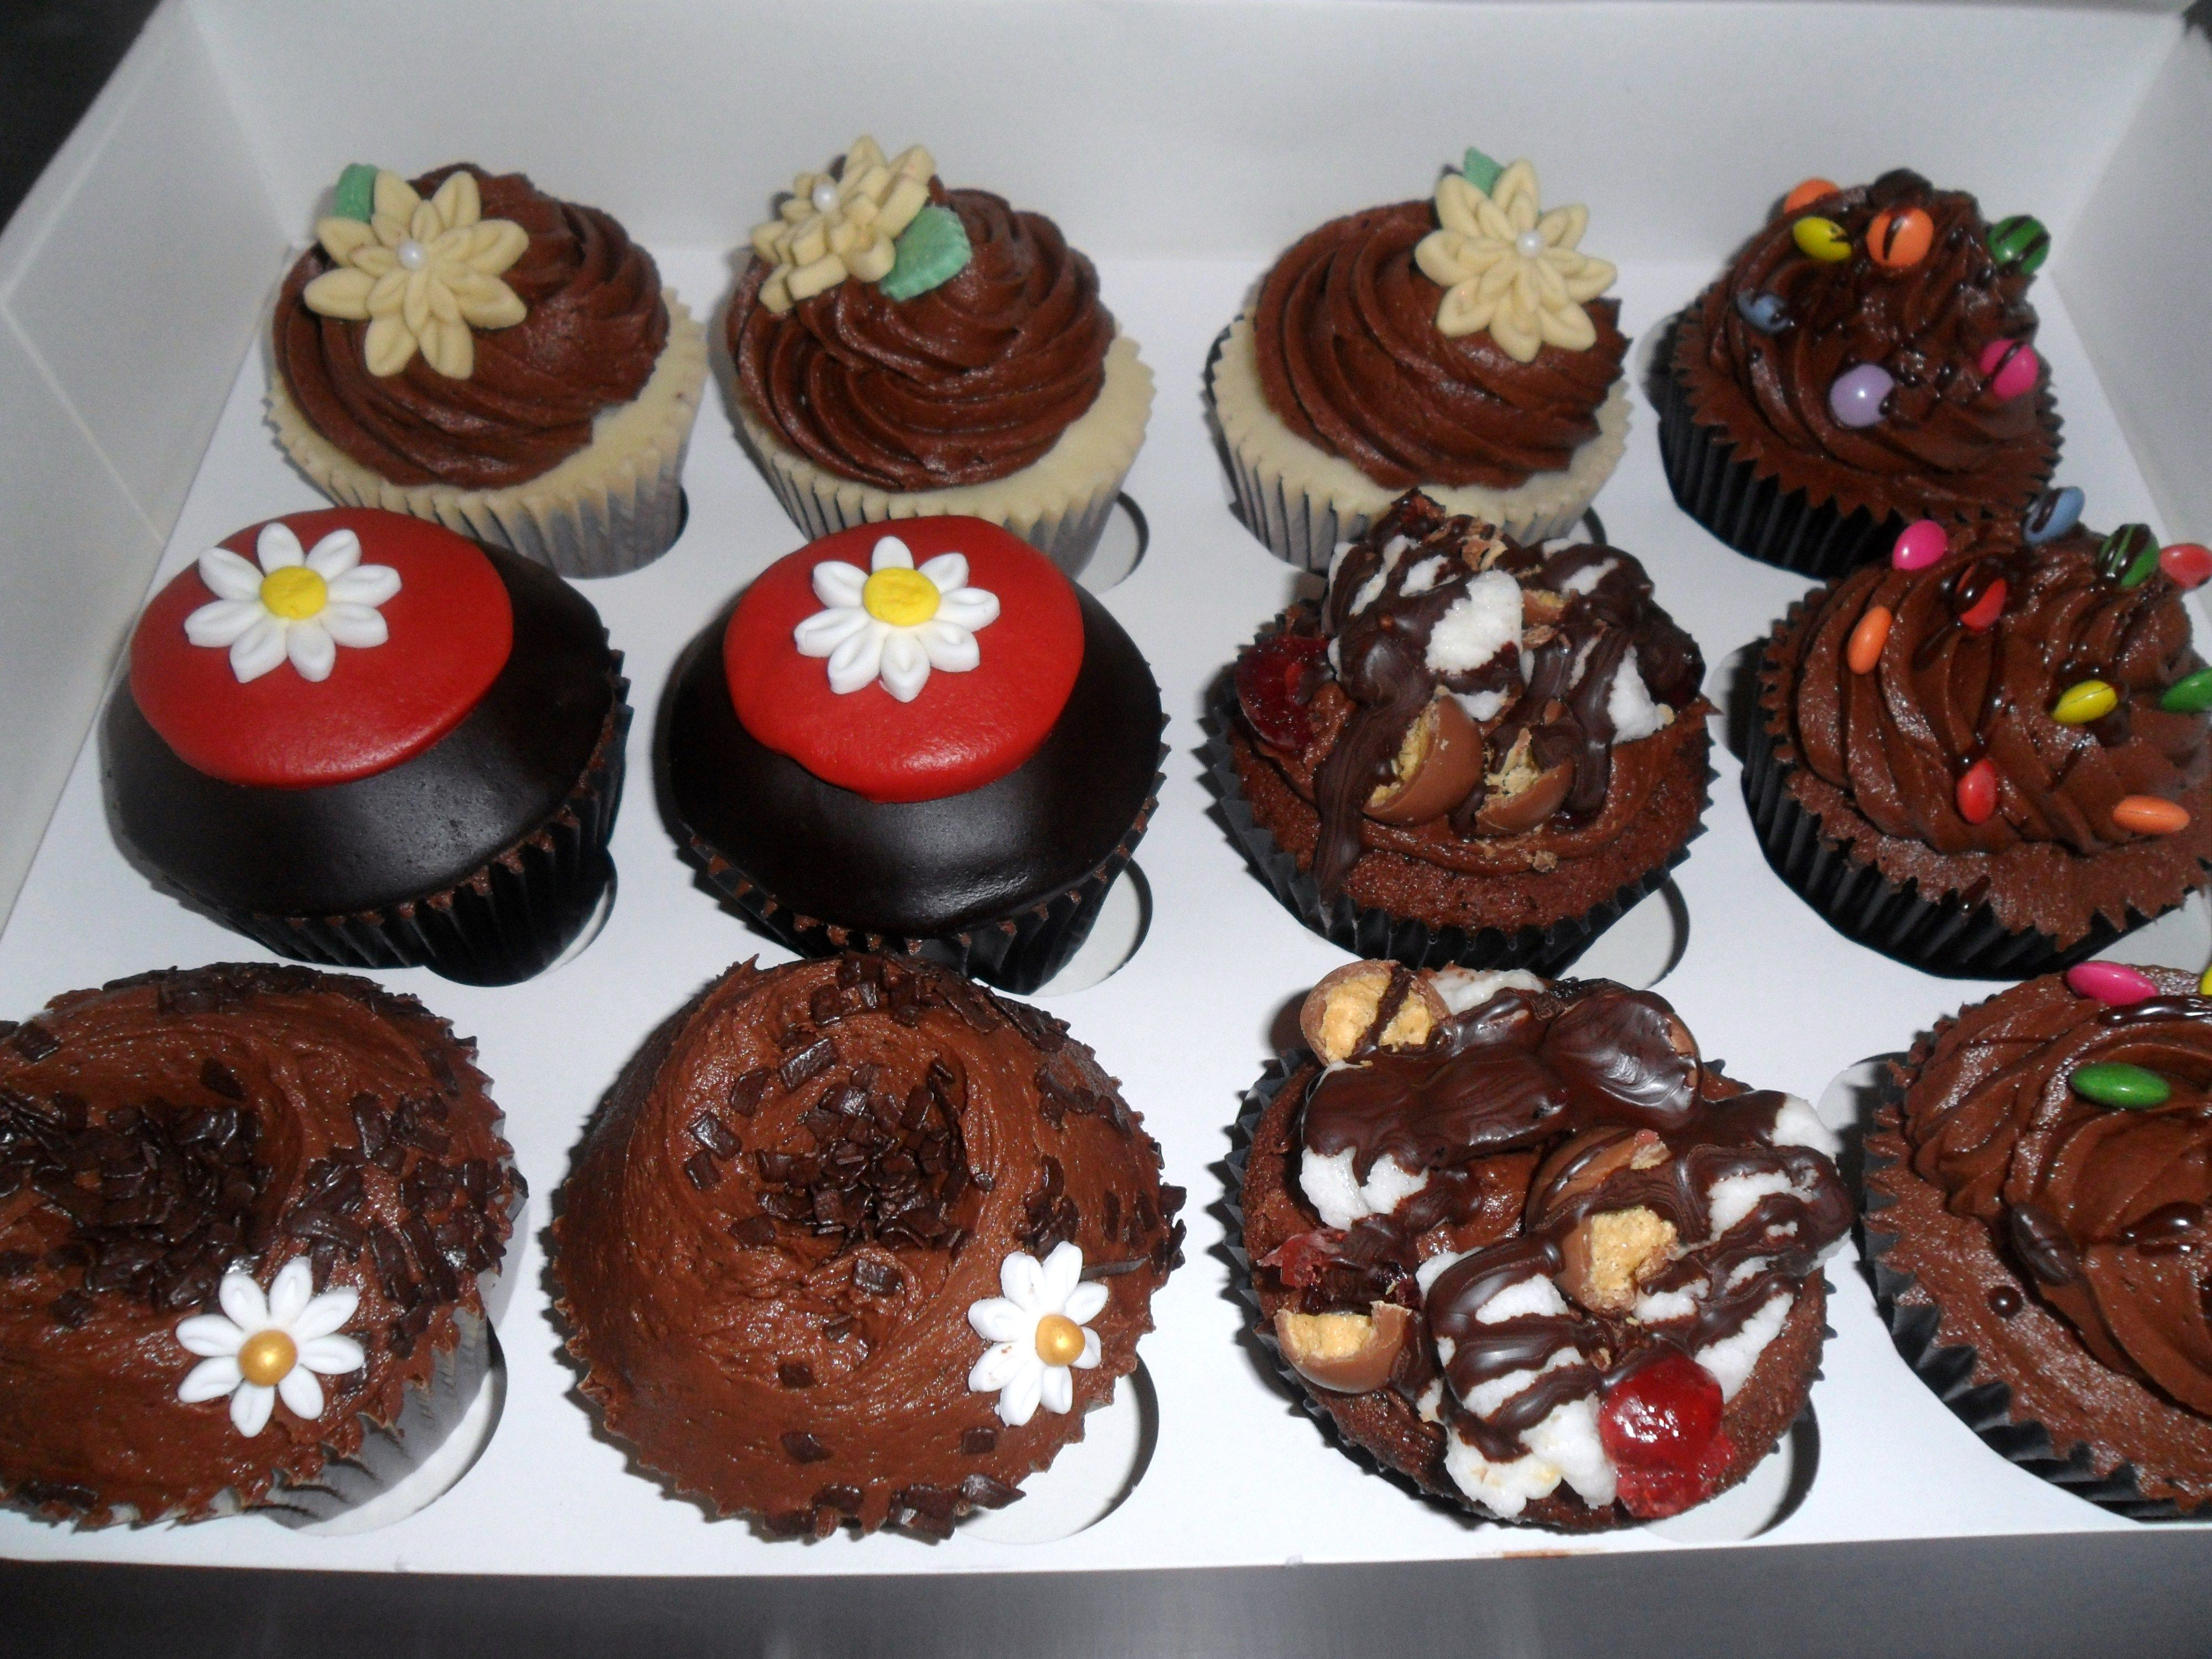 Raffle Prize Idea Dozen Cupcakes From Local Bakery